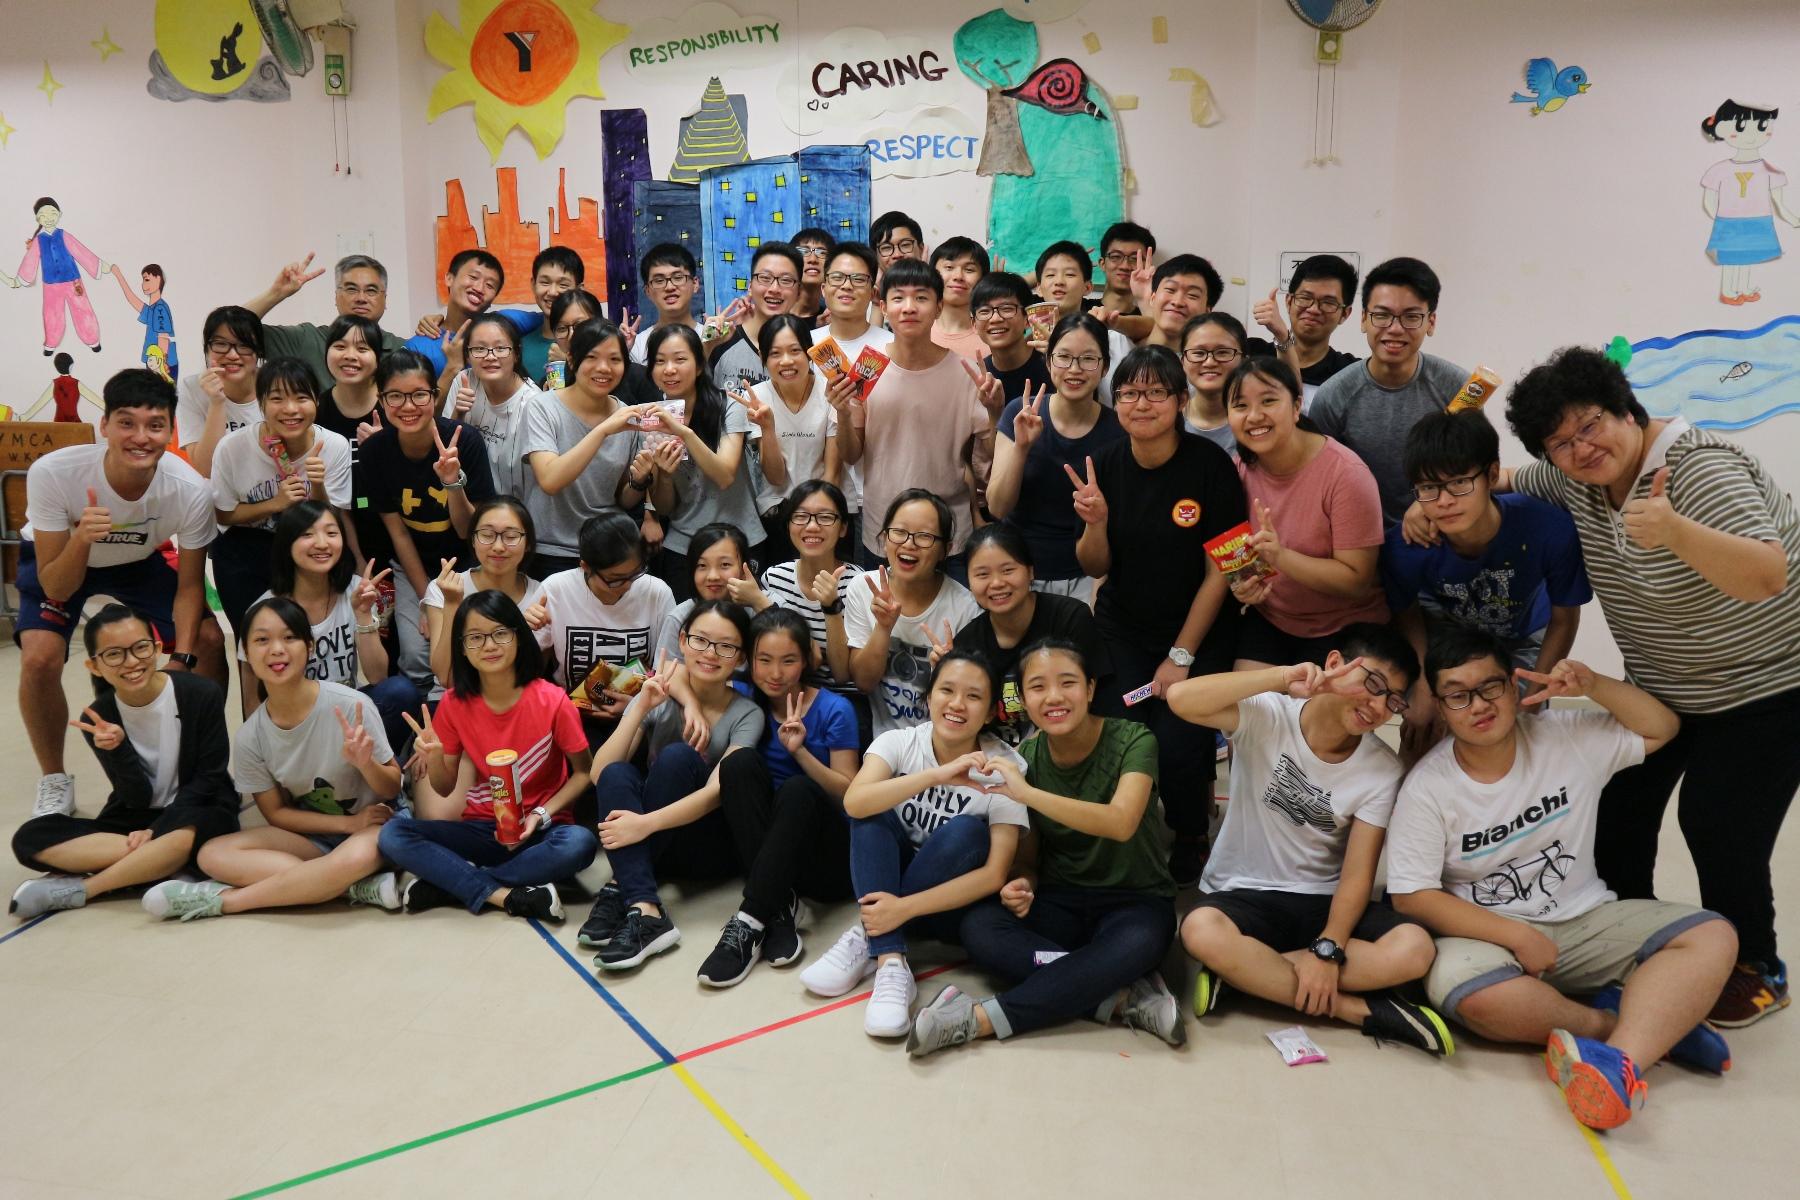 http://www.npc.edu.hk/sites/default/files/img_3337.jpg